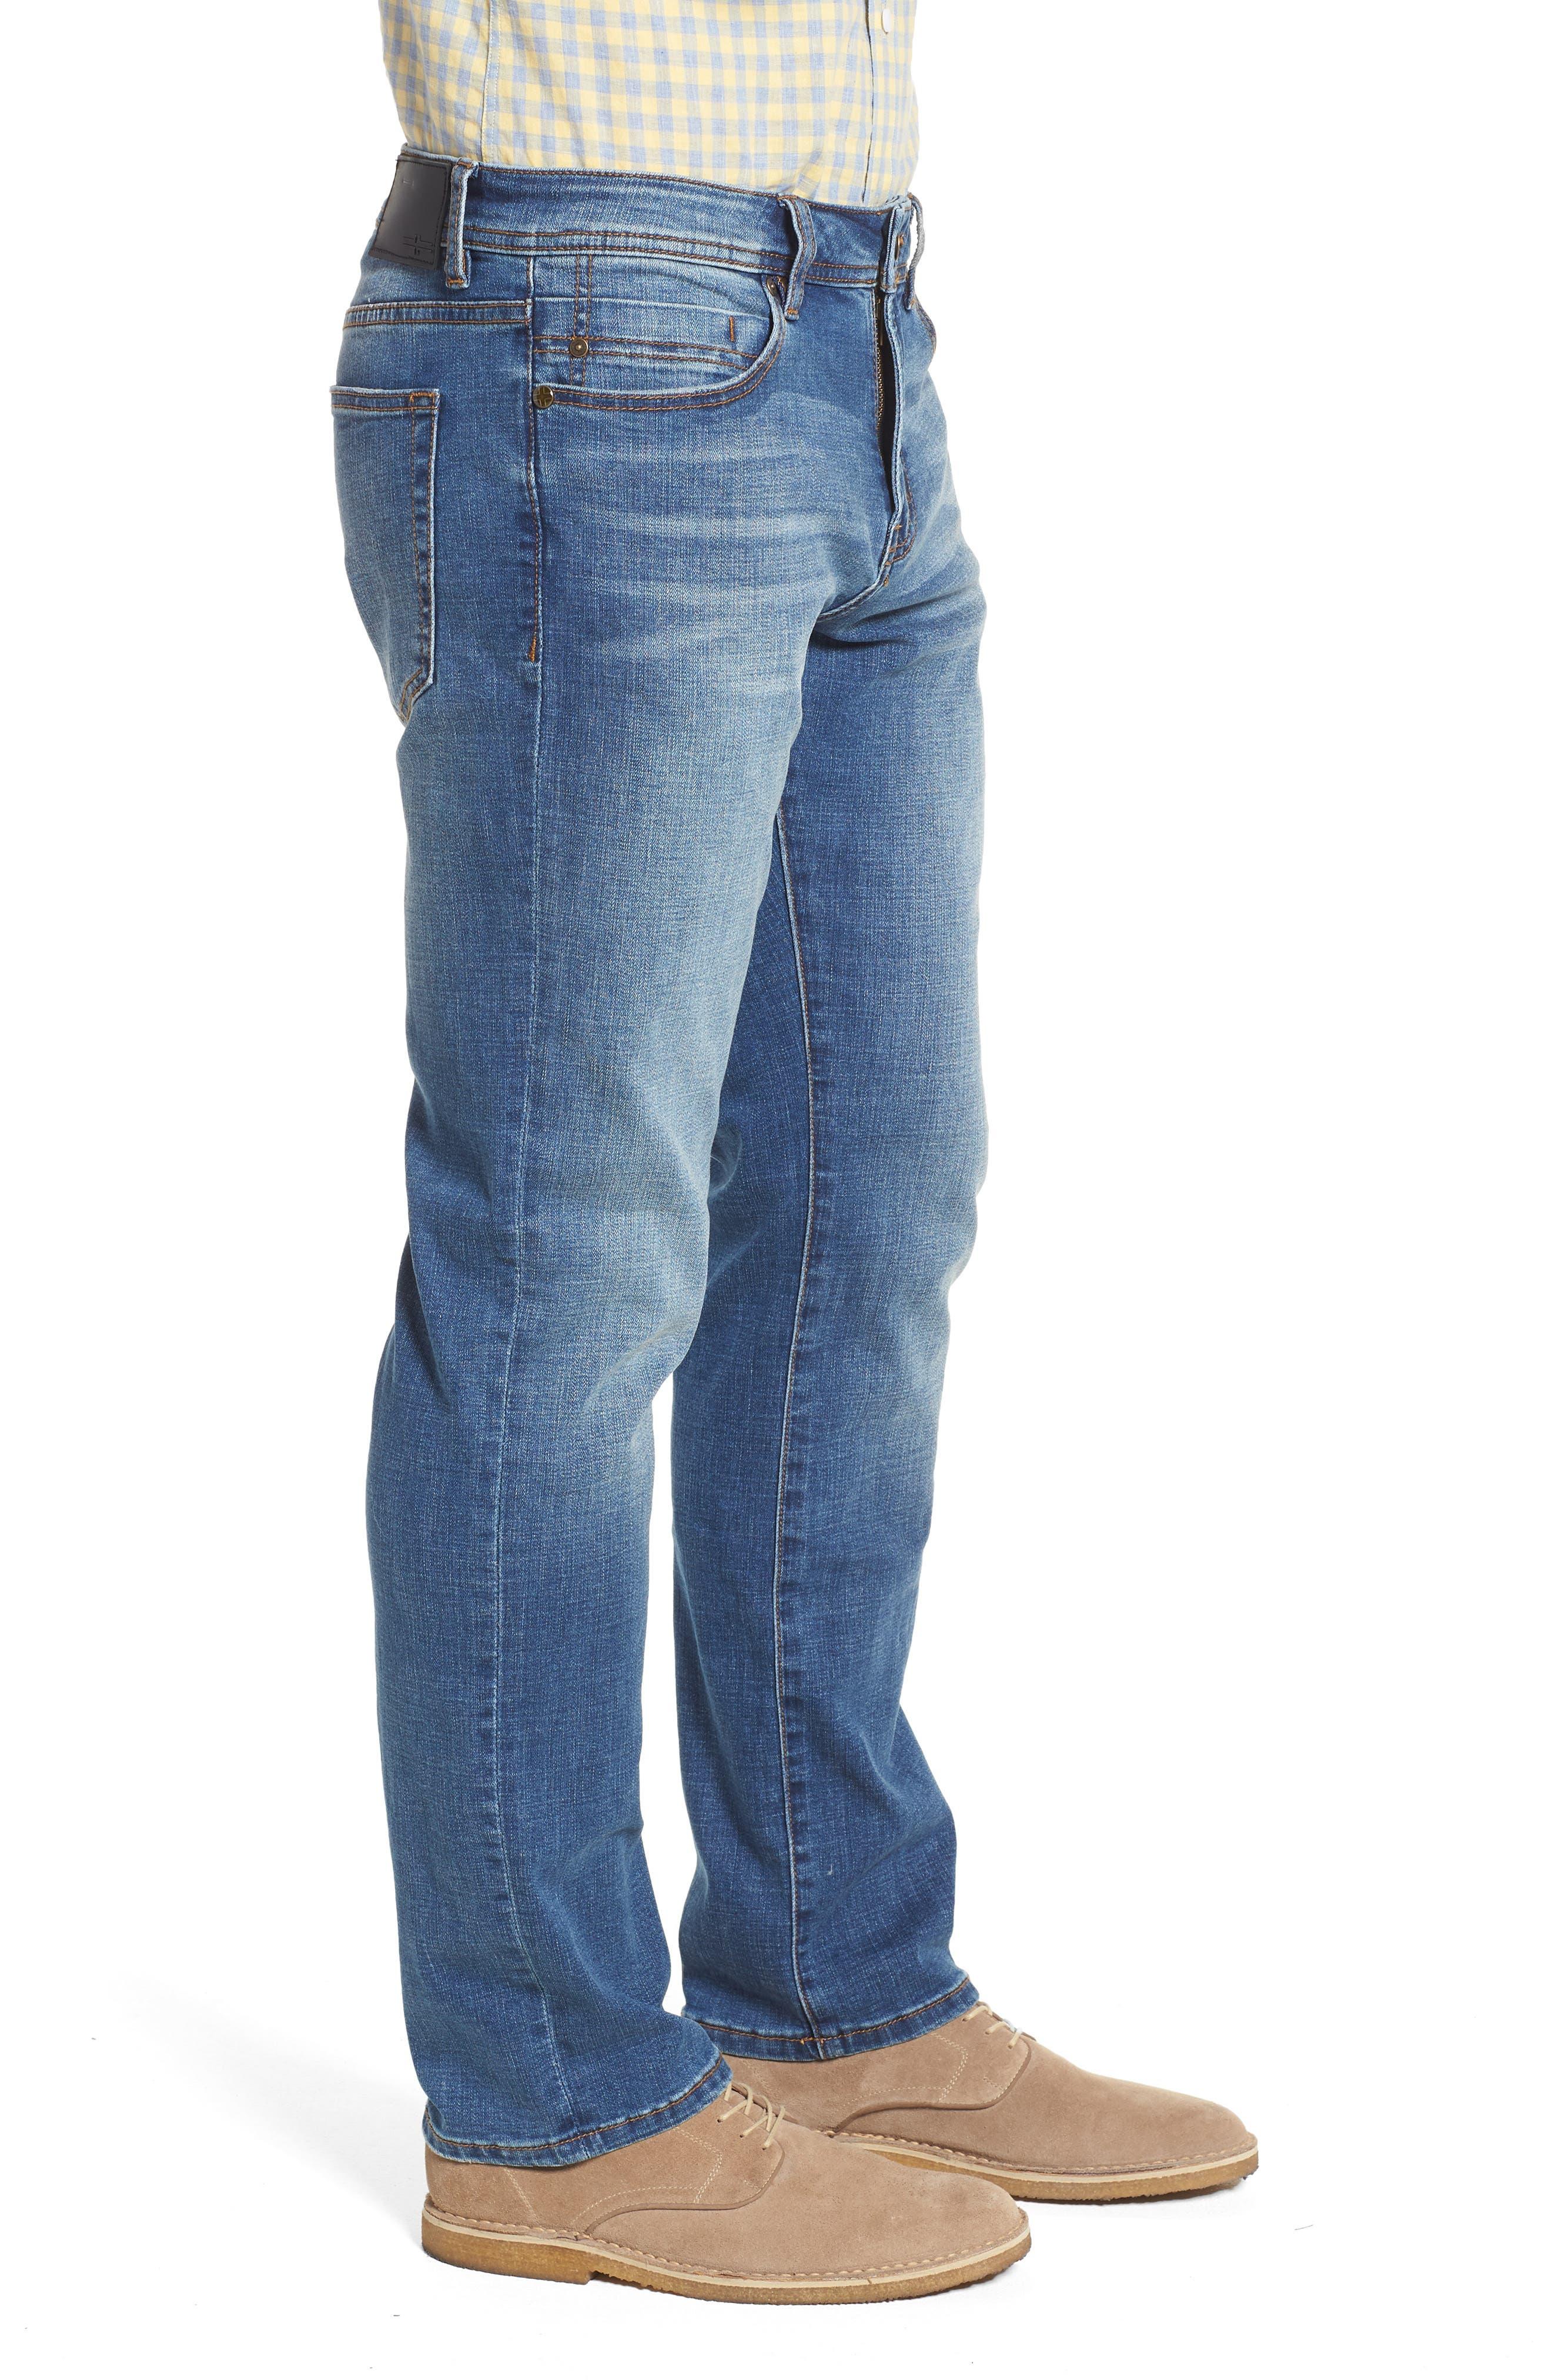 Jeans Co. Regent Relaxed Straight Leg Jeans,                             Alternate thumbnail 3, color,